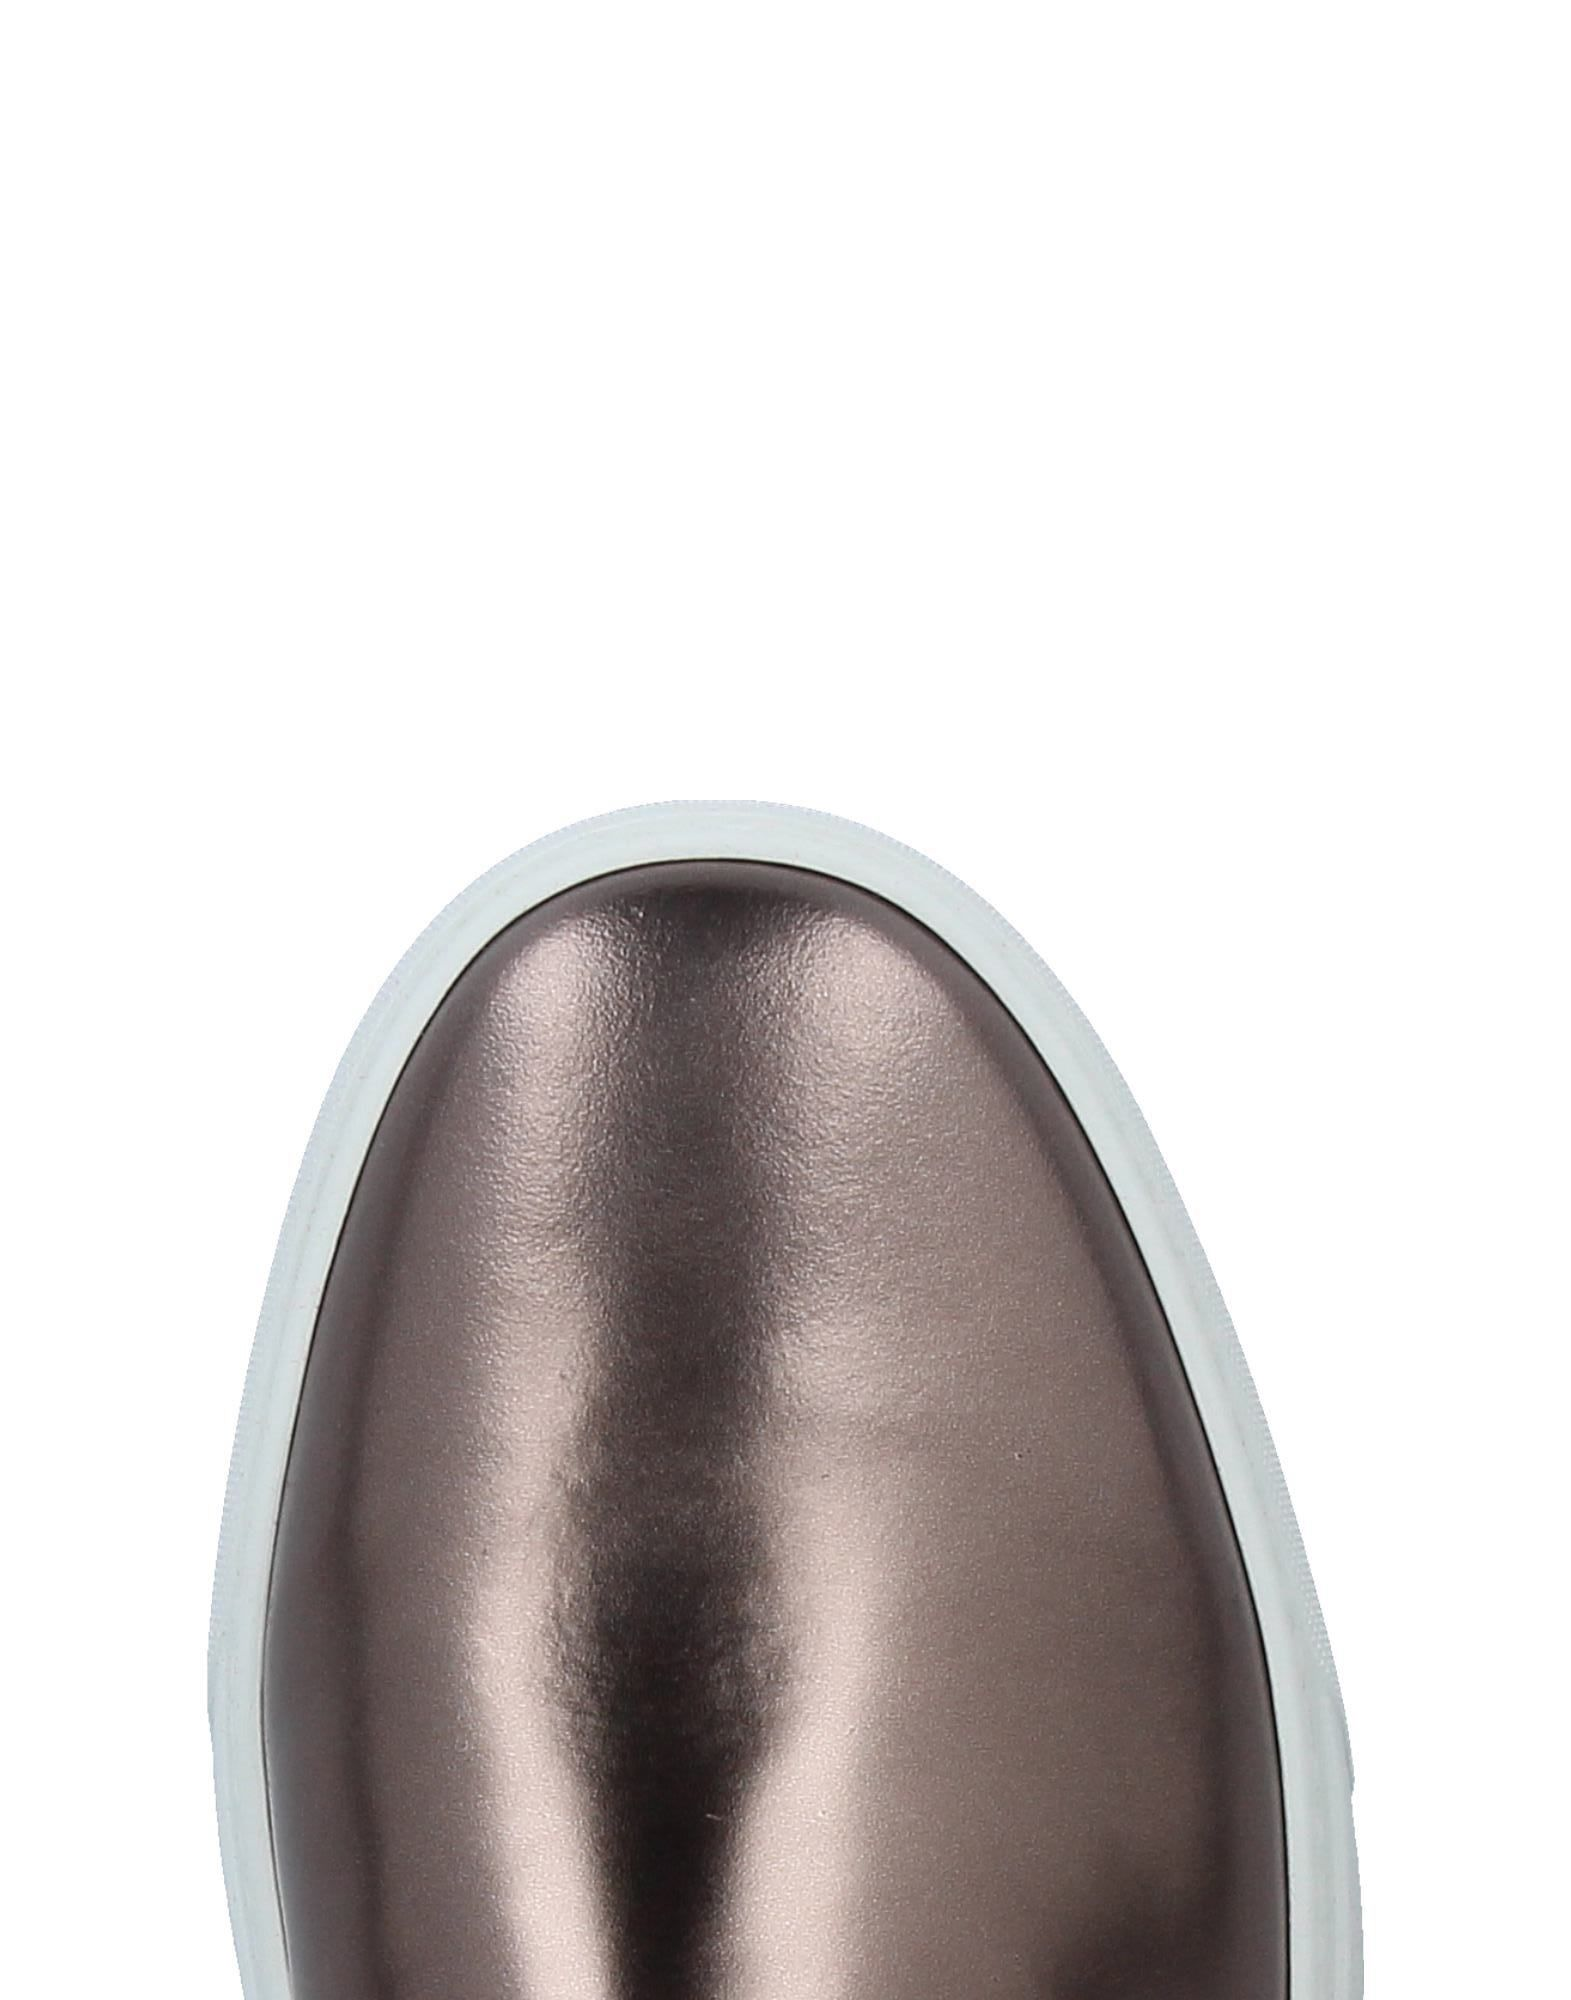 Attimonelli's Sneakers Herren  Schuhe 11409106LW Heiße Schuhe  2753b6